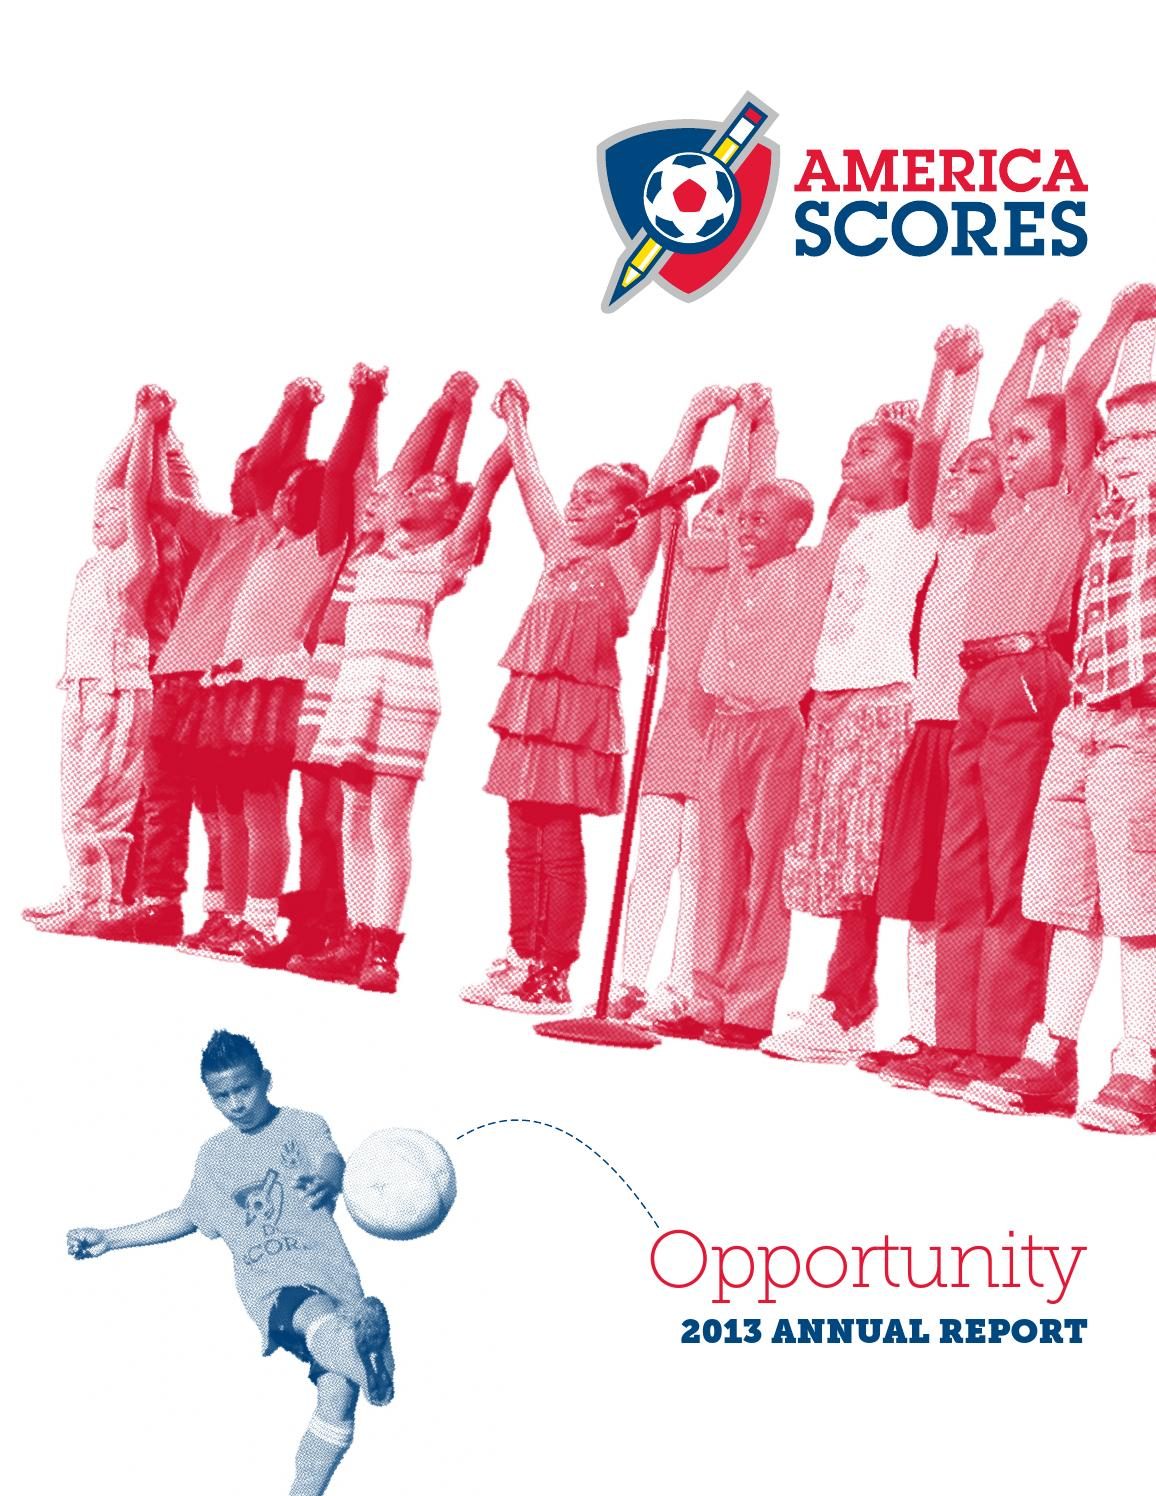 america scores annual report by america scores issuu